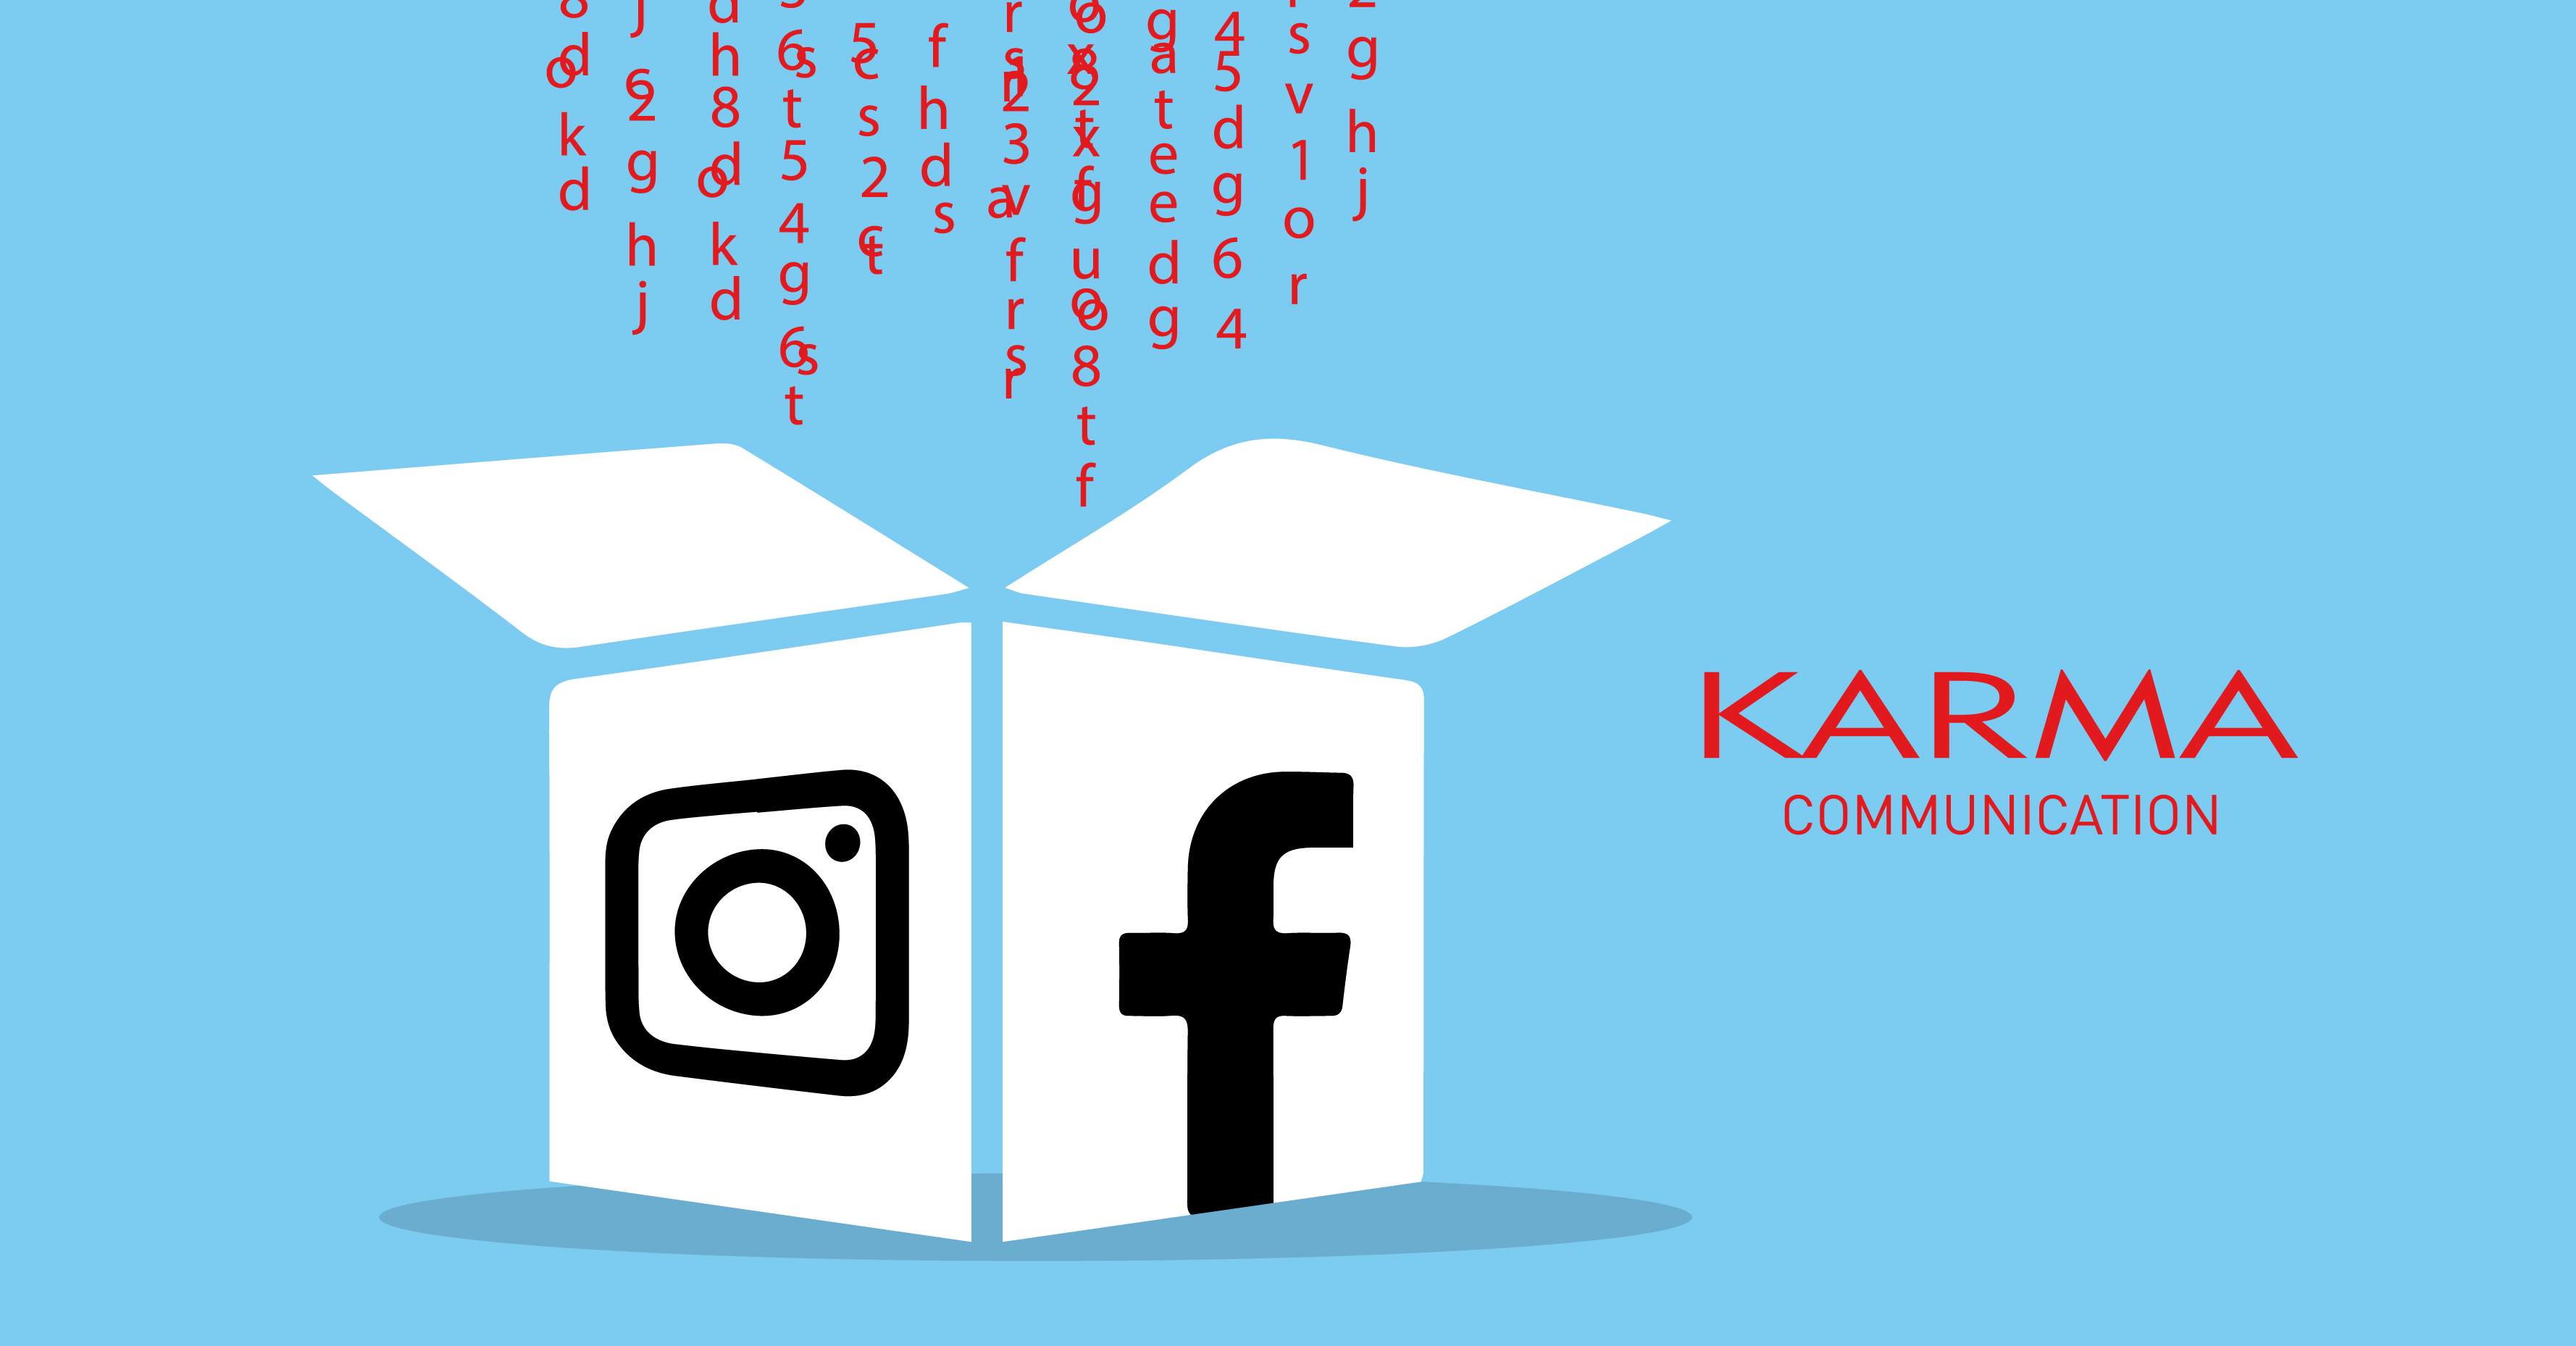 Karma Communication - Blog aziendale fatto bene